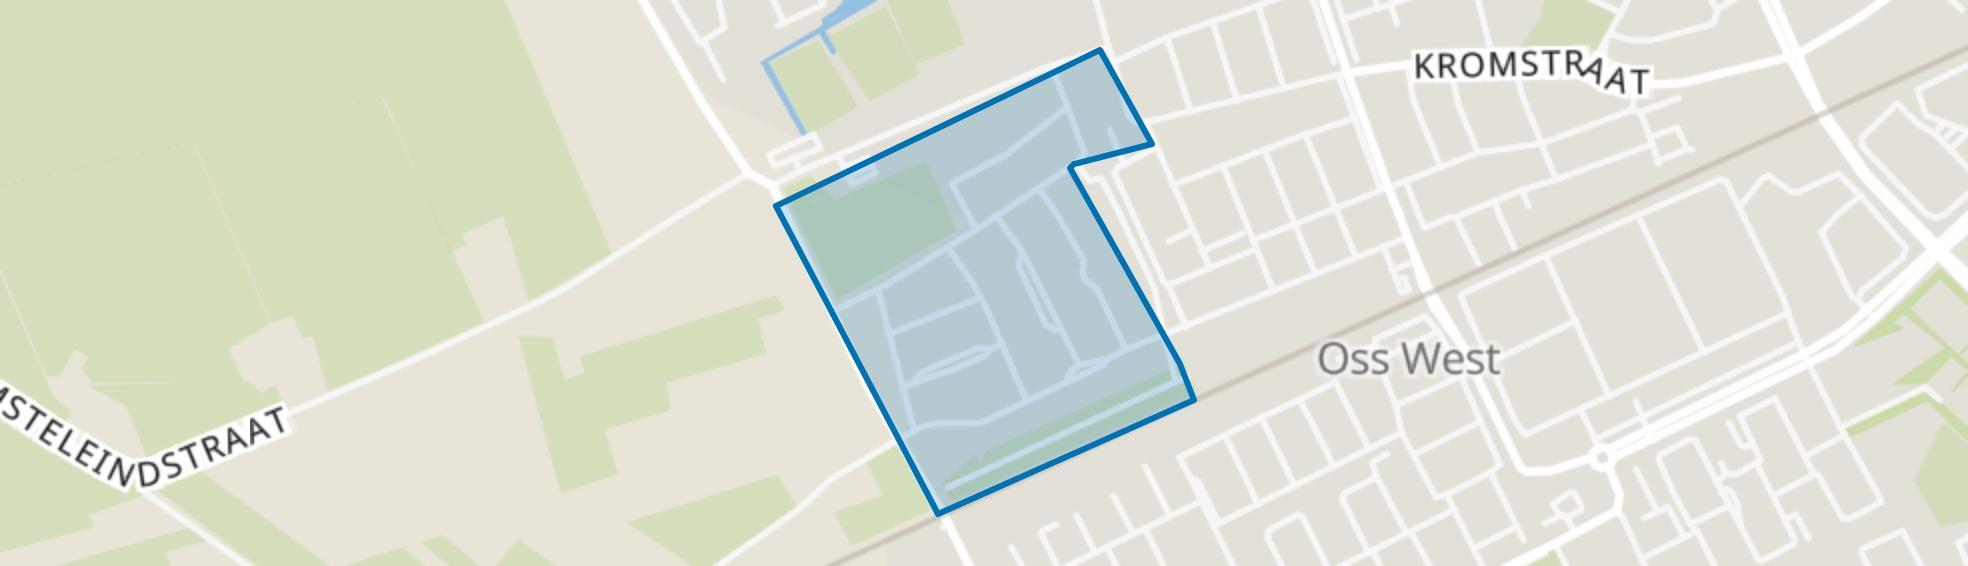 Heihoek, Oss map